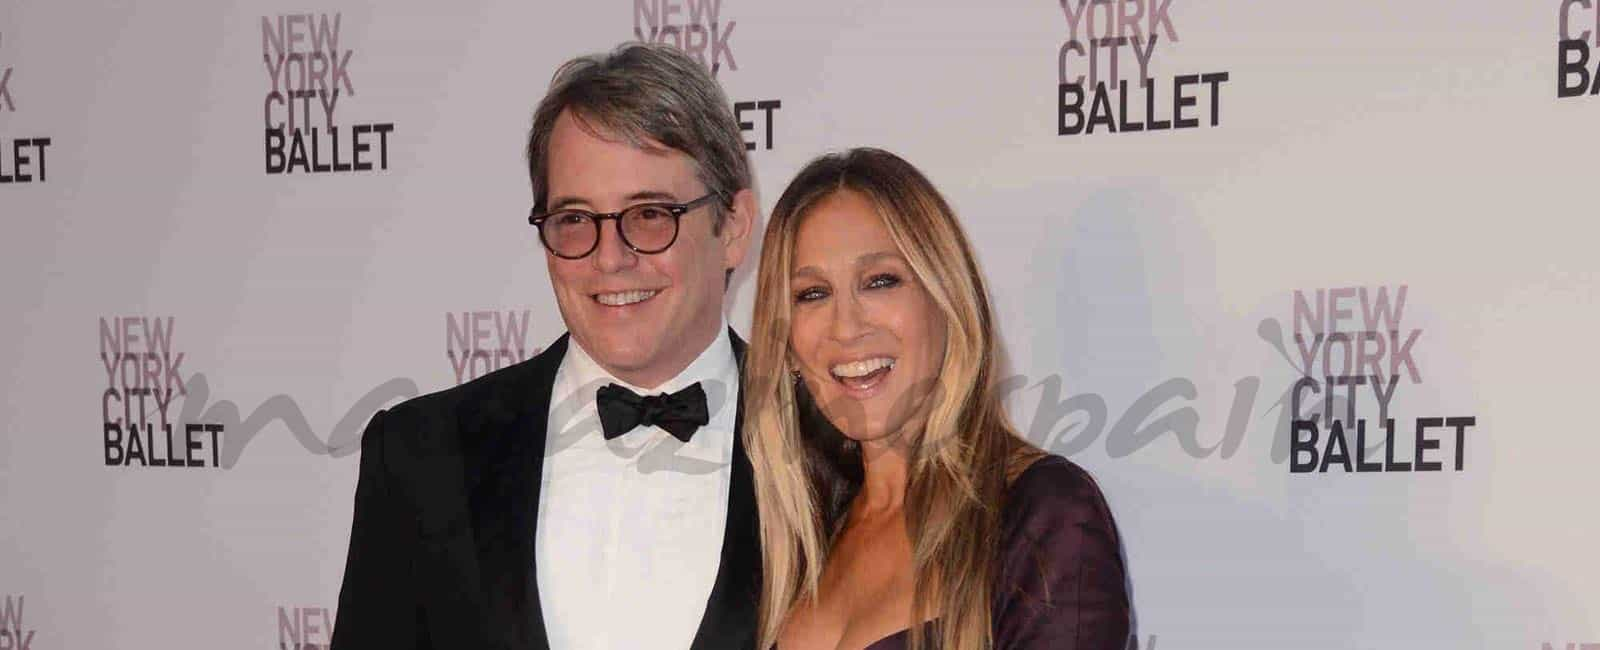 Sarah Jessica Parker vuelve a convertirse en Carrie Bradshaw, protagonista de «Sexo en Nueva York»